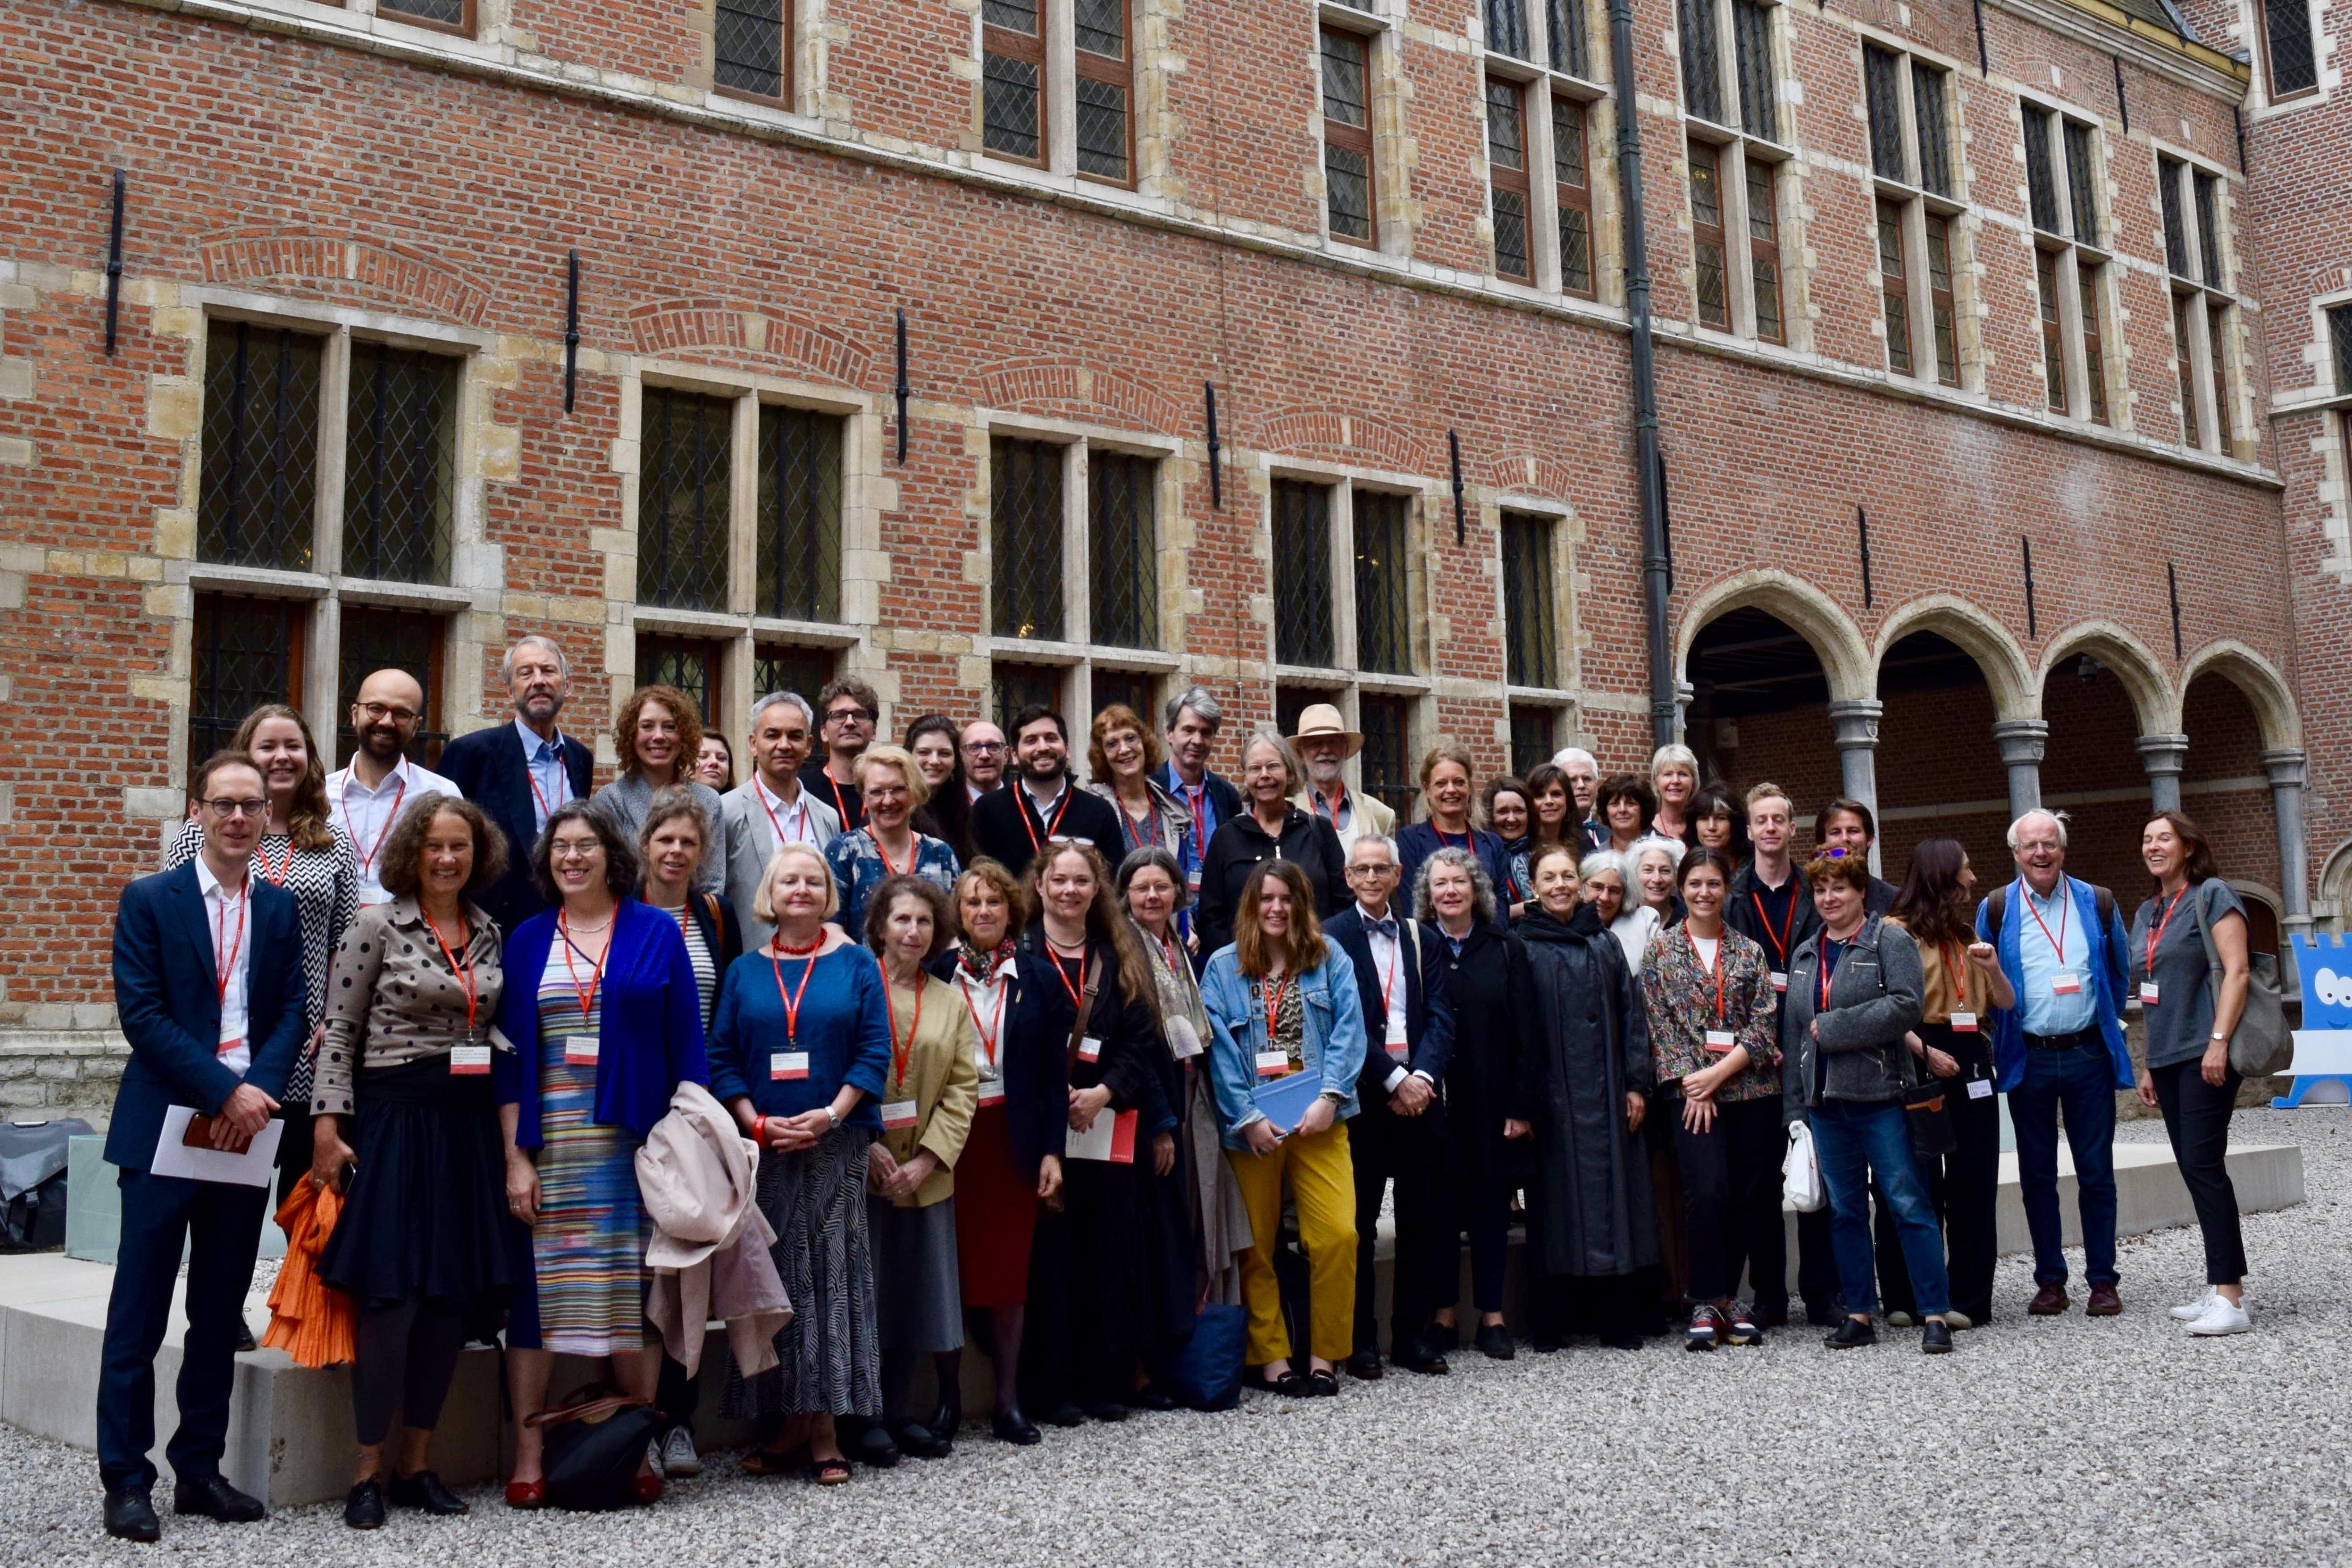 A Merry Company. Participants of the CODARTfocus Mechelen